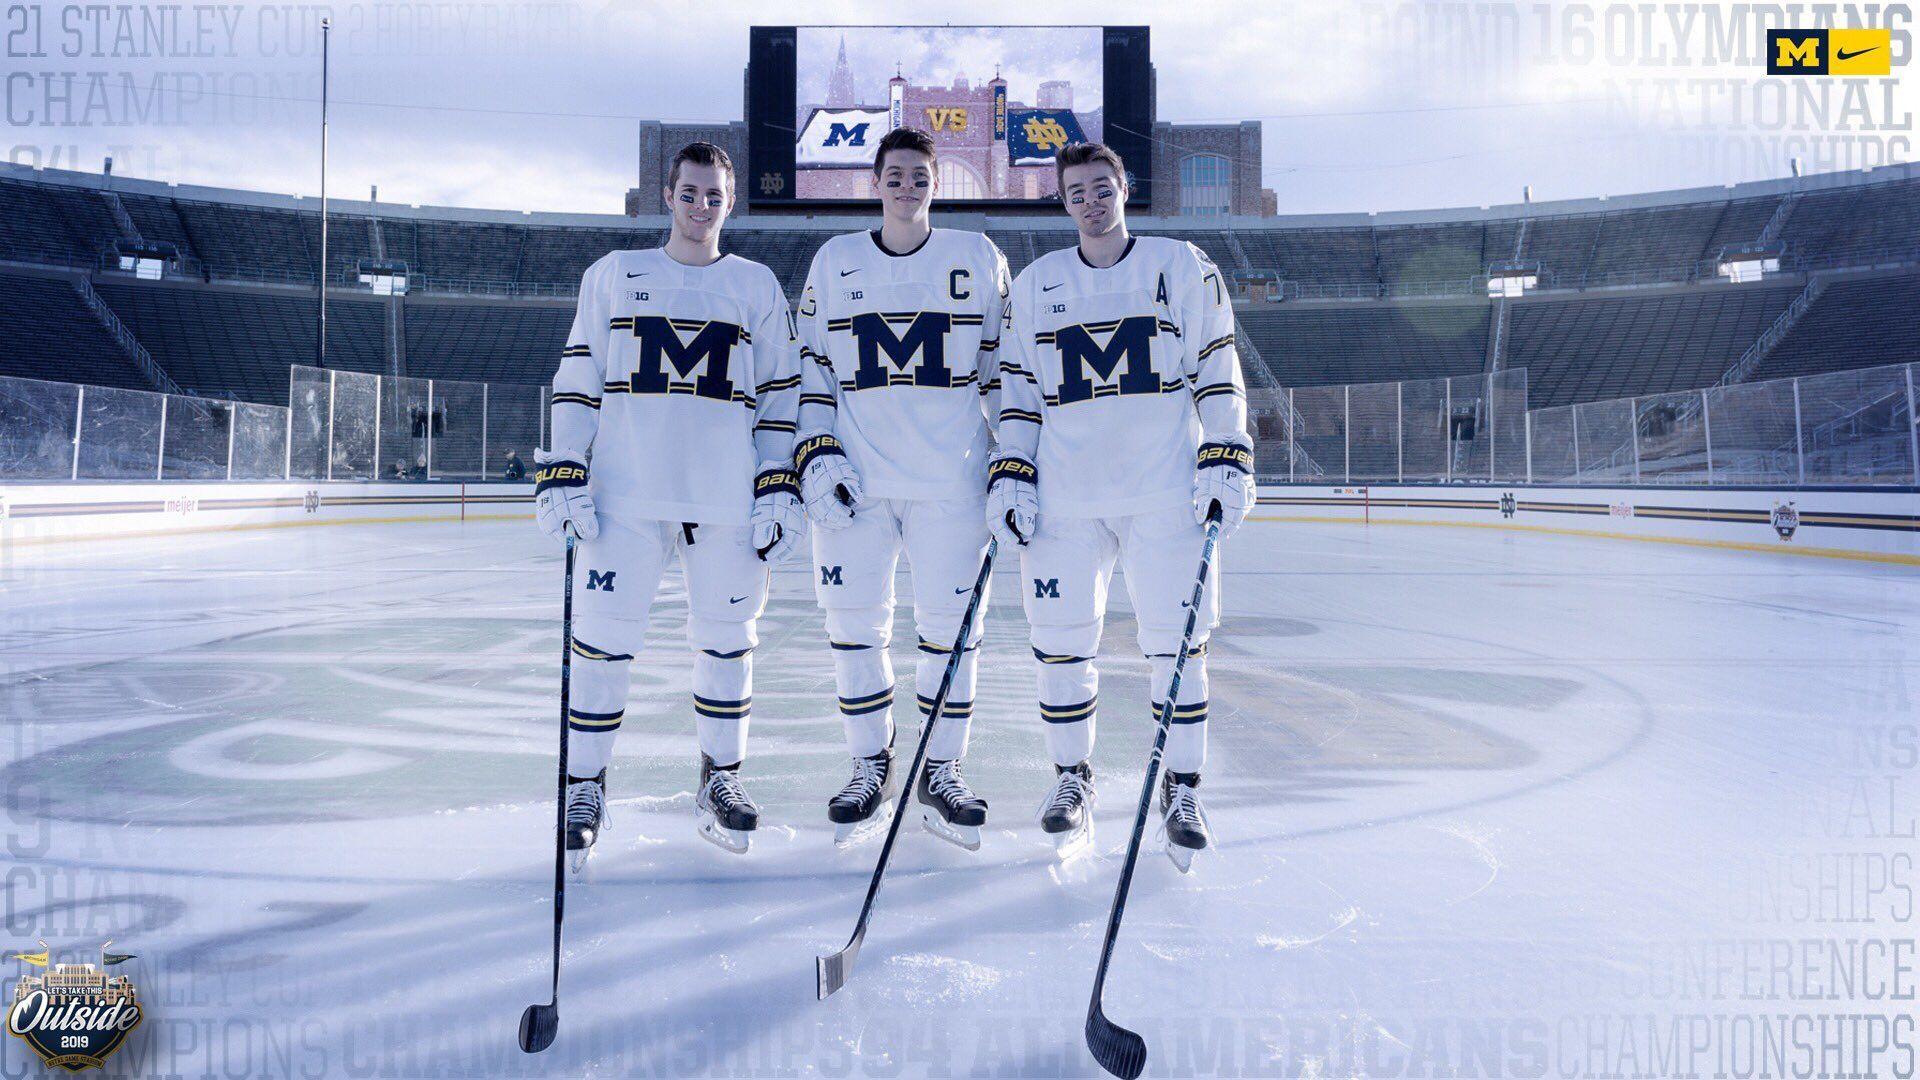 Bucci Mane On Twitter Michigan Hockey Hockey Uniforms Hockey